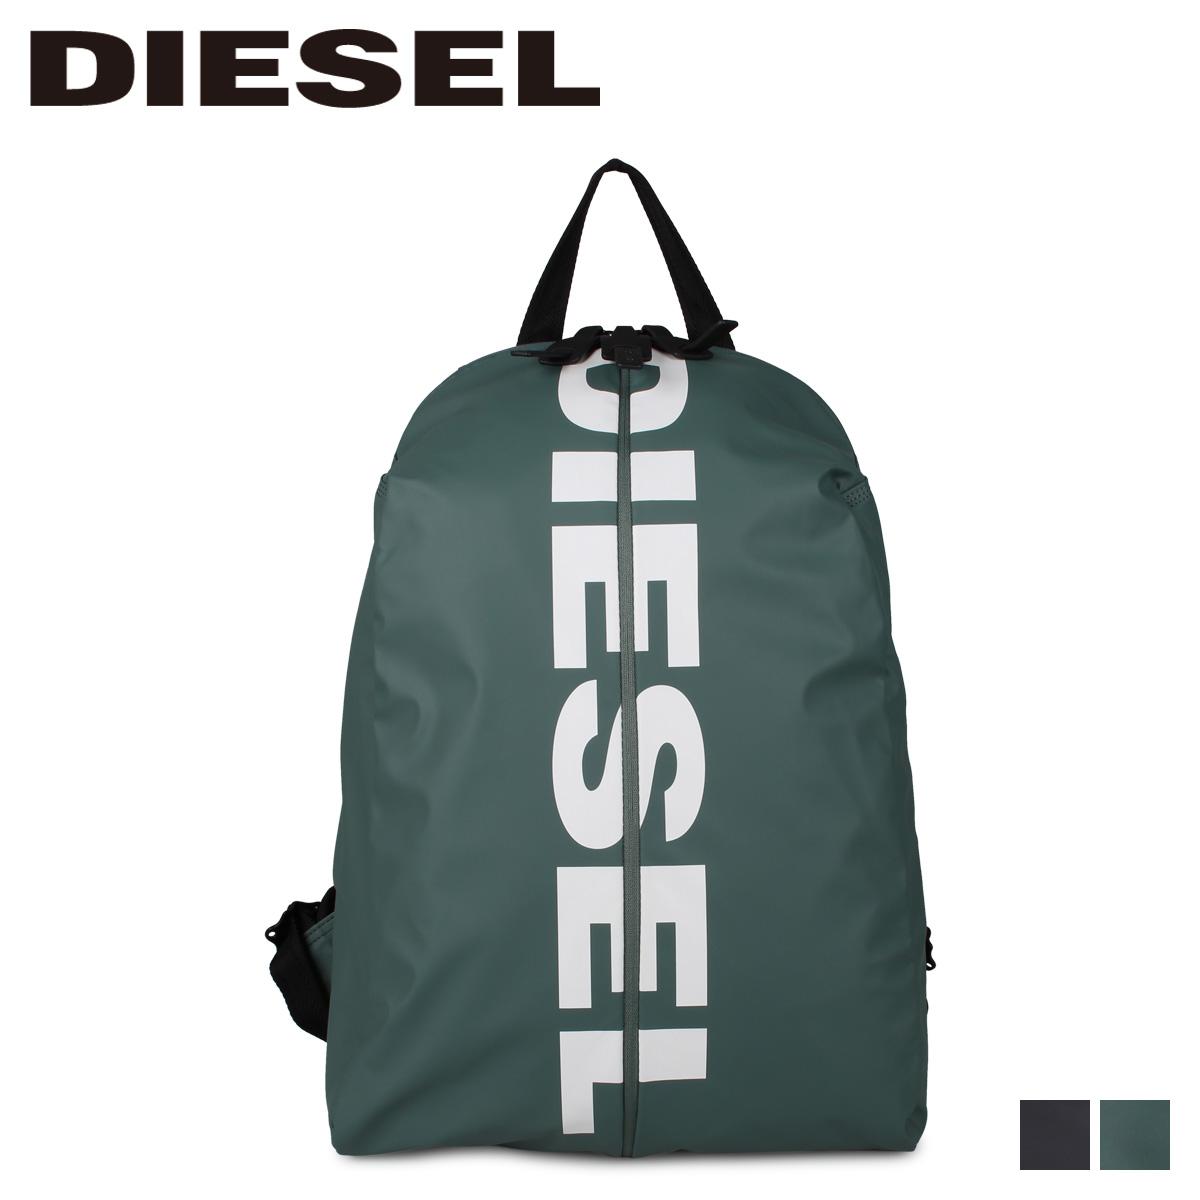 DIESEL ディーゼル バッグ リュック バックパック メンズ F-BOLD BACK ブラック グリーン 黒 X05479 P1705 [4/20 追加入荷]